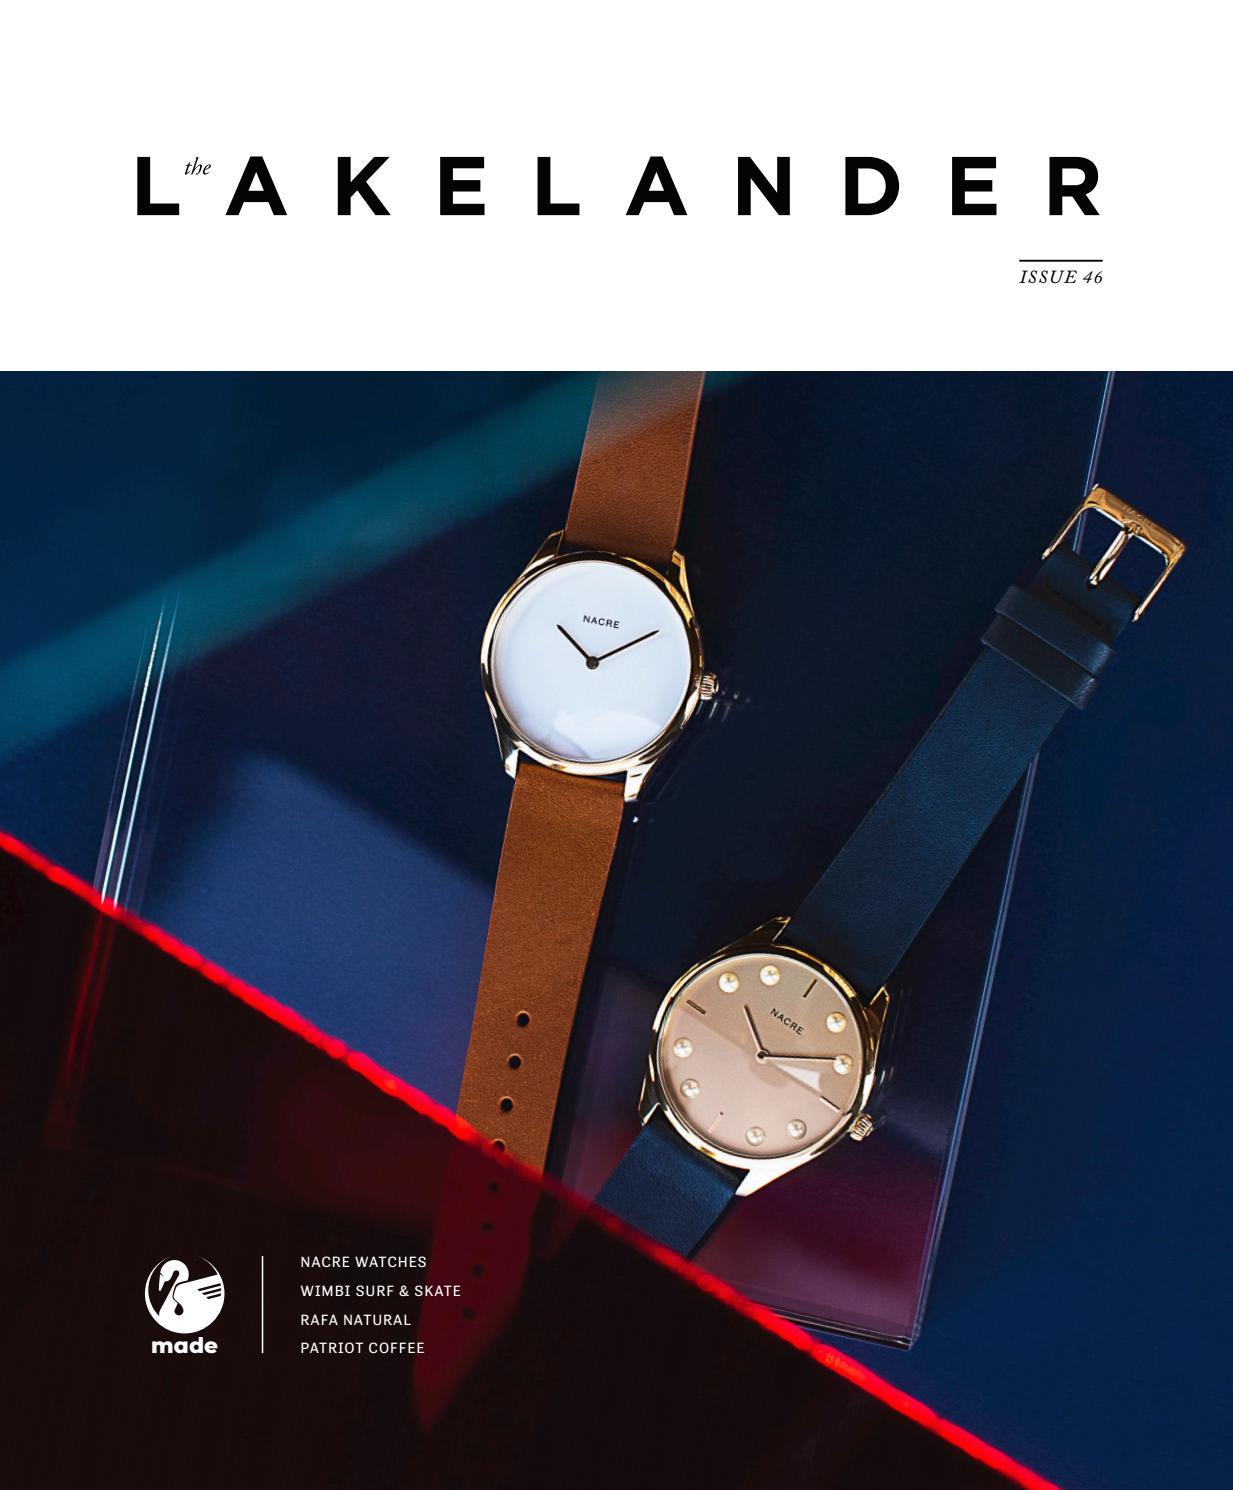 d654da8d883c The Lakelander - Issue 46   Lakelander Made by The Lakelander - issuu